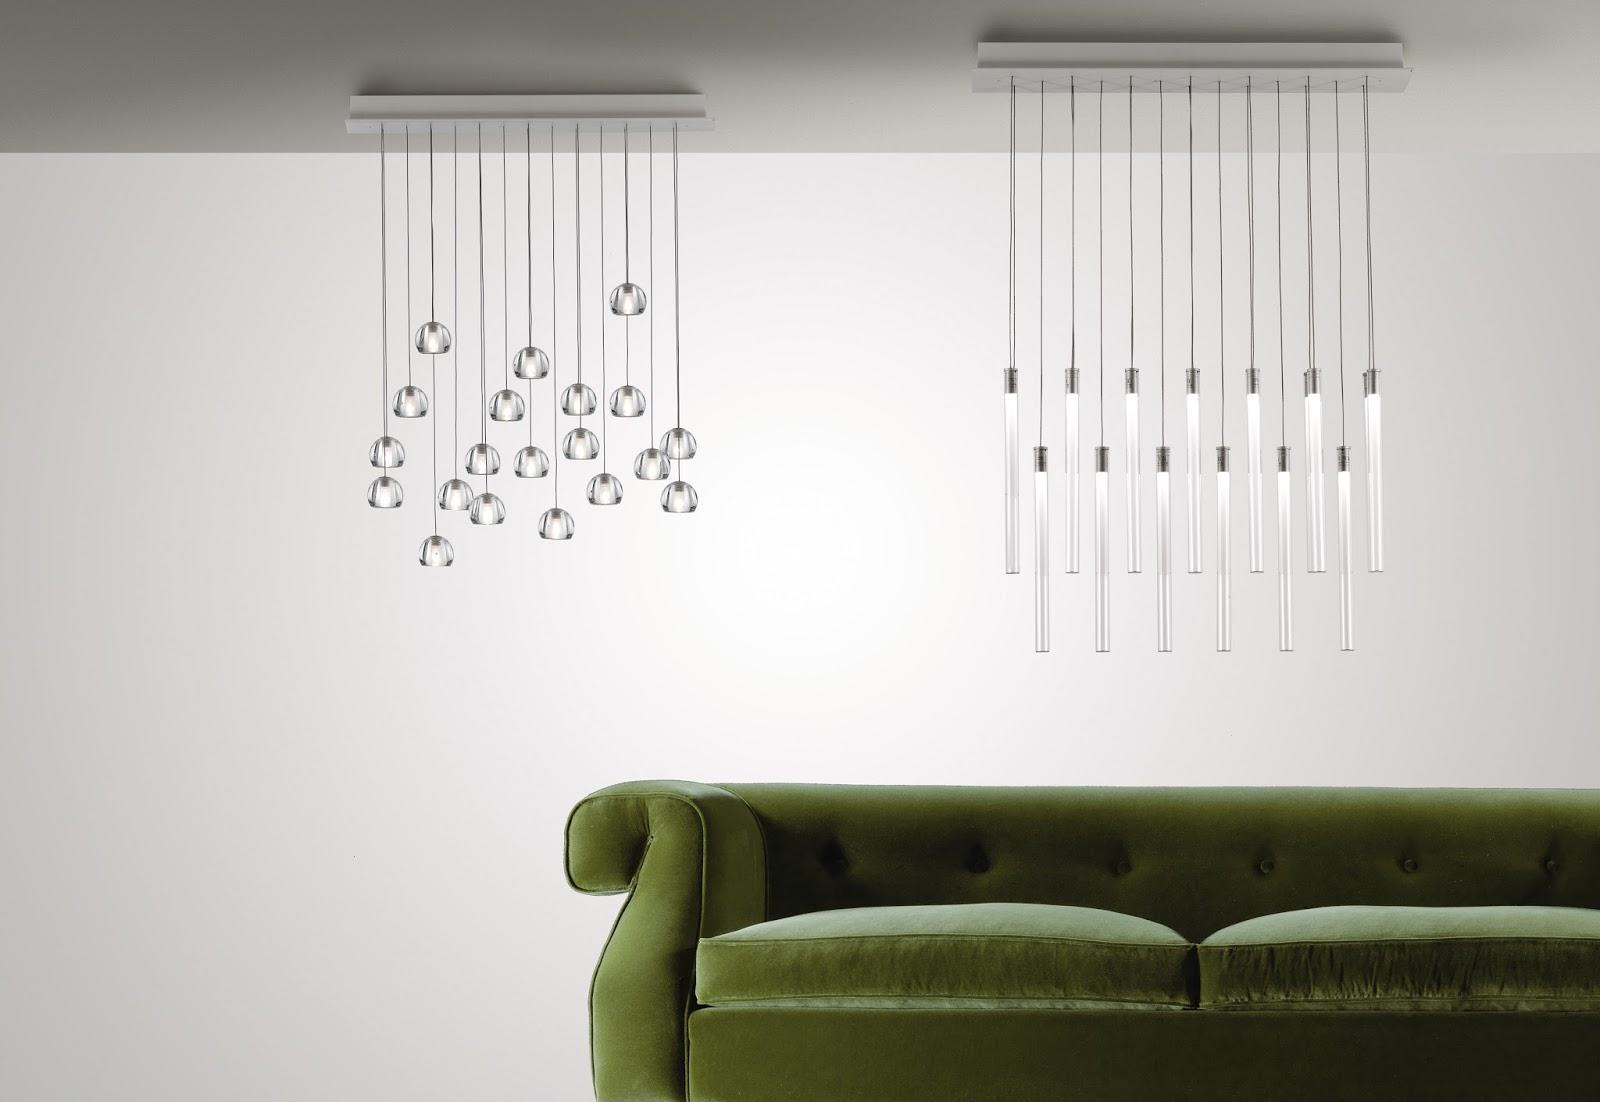 Lampadari moderni leroy merlin idee creative di interni for Lampadari leroy merlin led